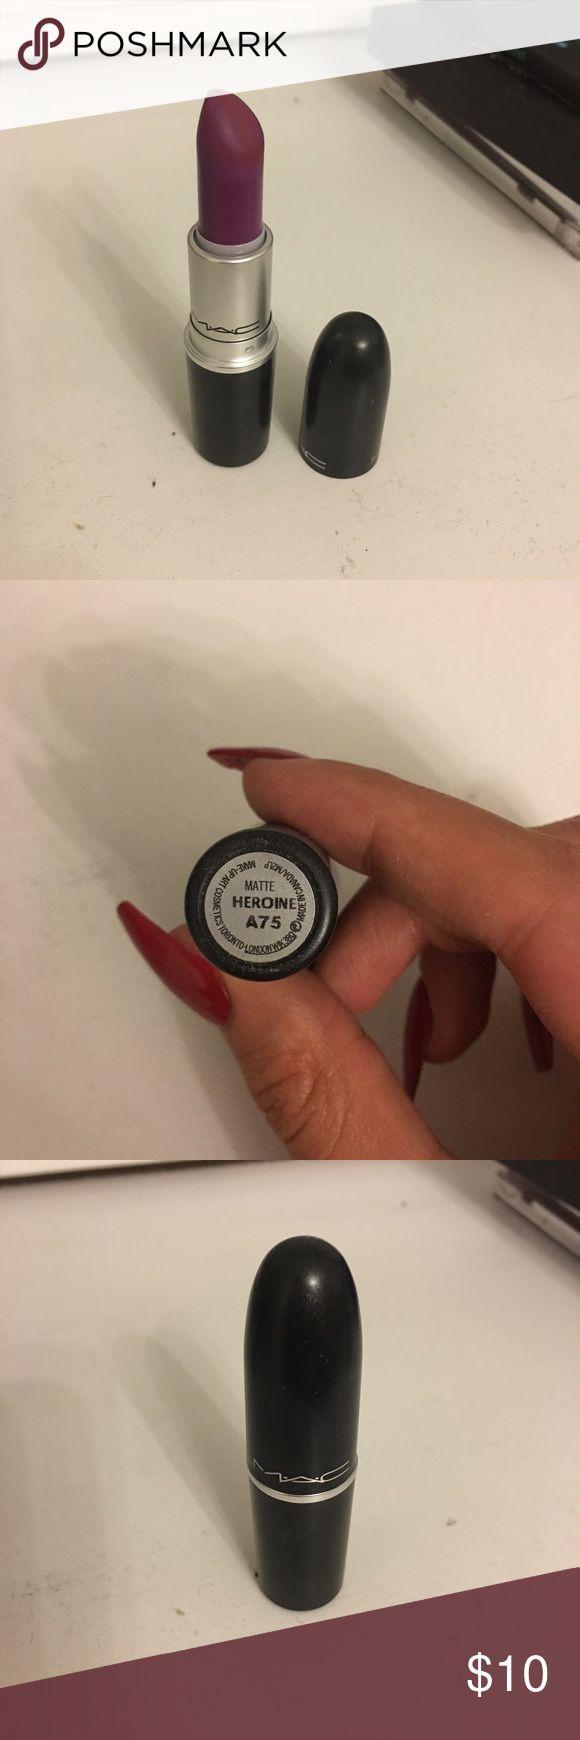 Mac heroine lipstick. Has a matte finish. Used less than five times! MAC Cosmetics Makeup Lipstick